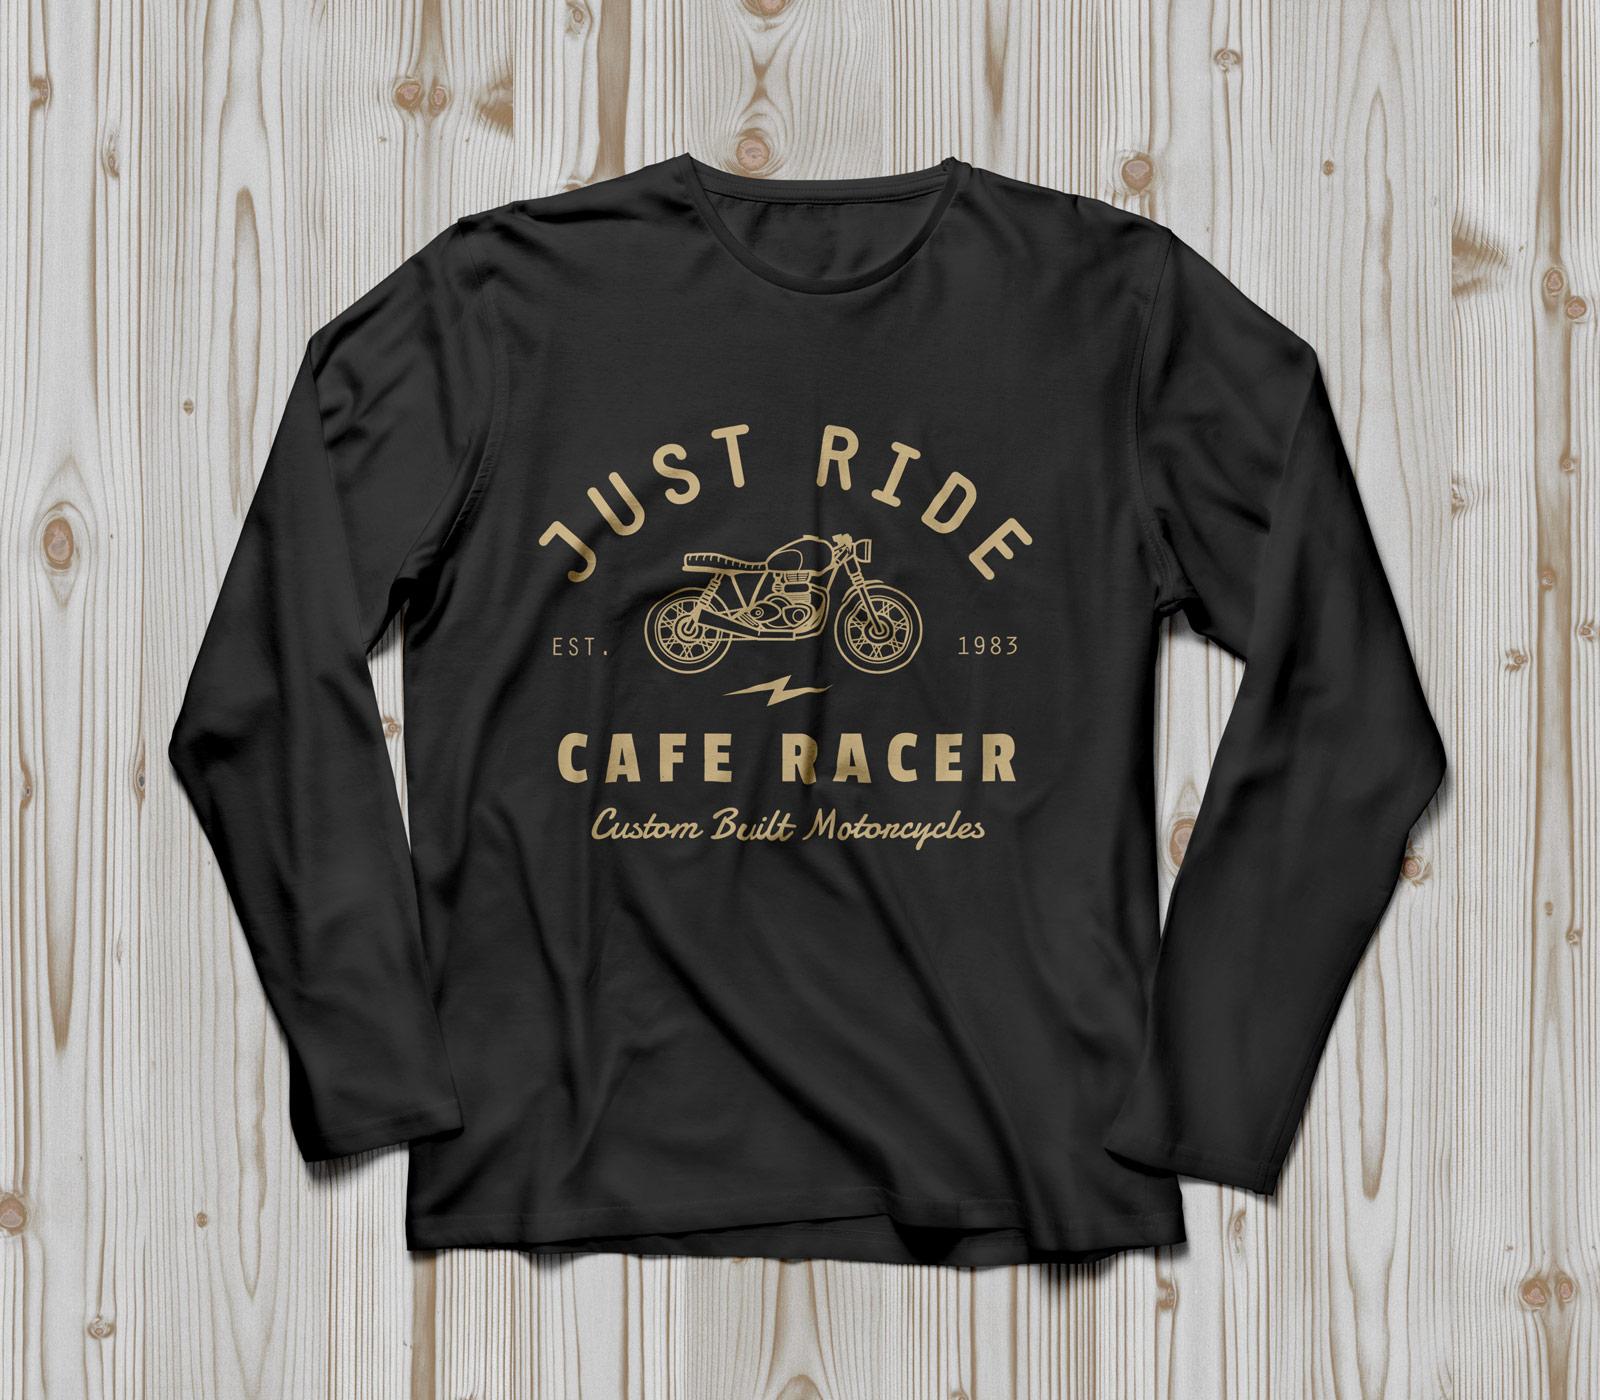 Free-Full-Sleeves-T-shirt-Mockup-PSD